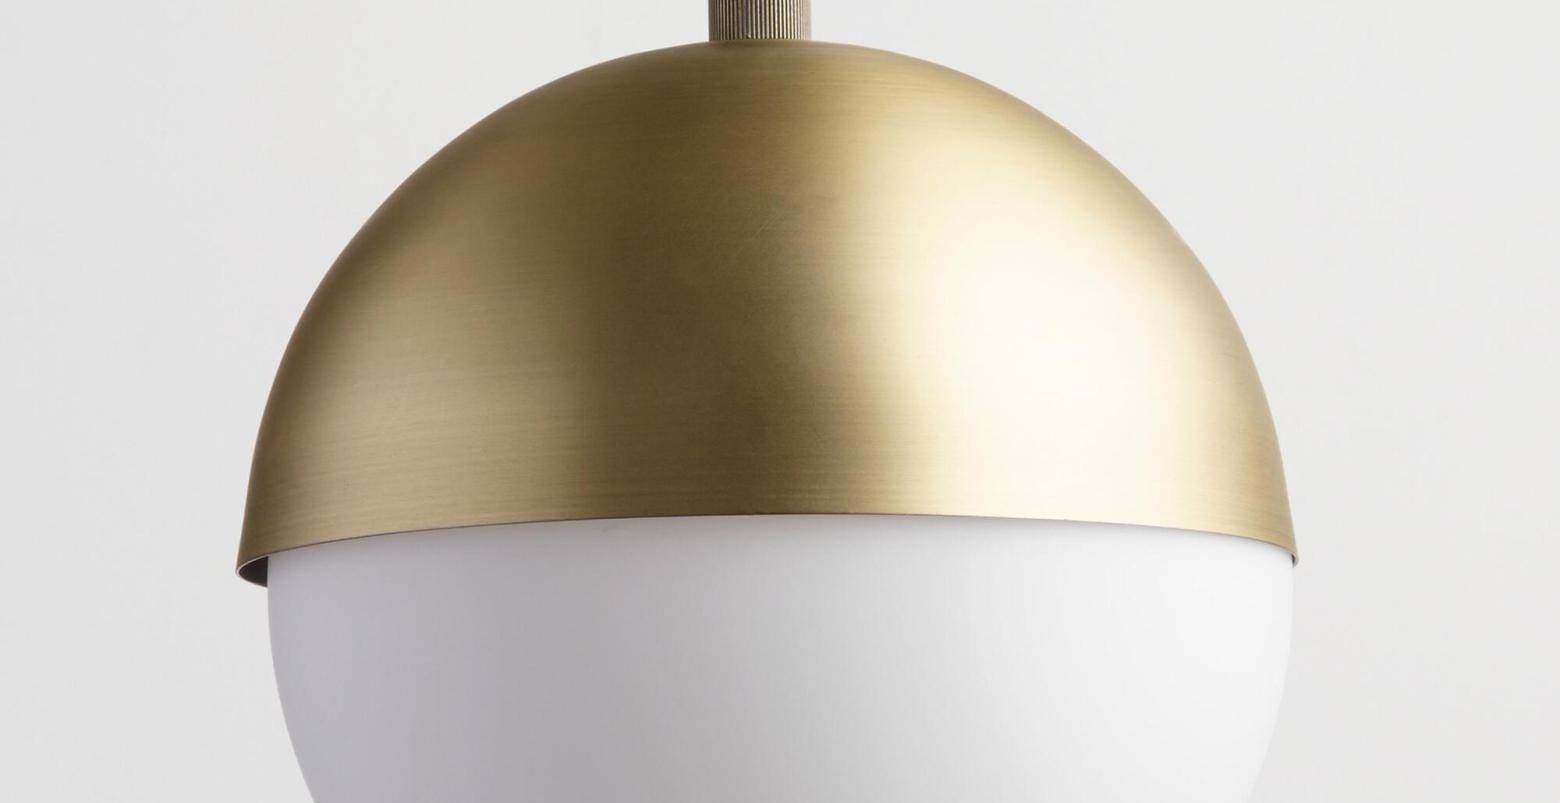 Lighting : Enchanting Pendant Light Fixtures Amazing Pendant Throughout Globe Pendant Light Fixtures (View 8 of 15)